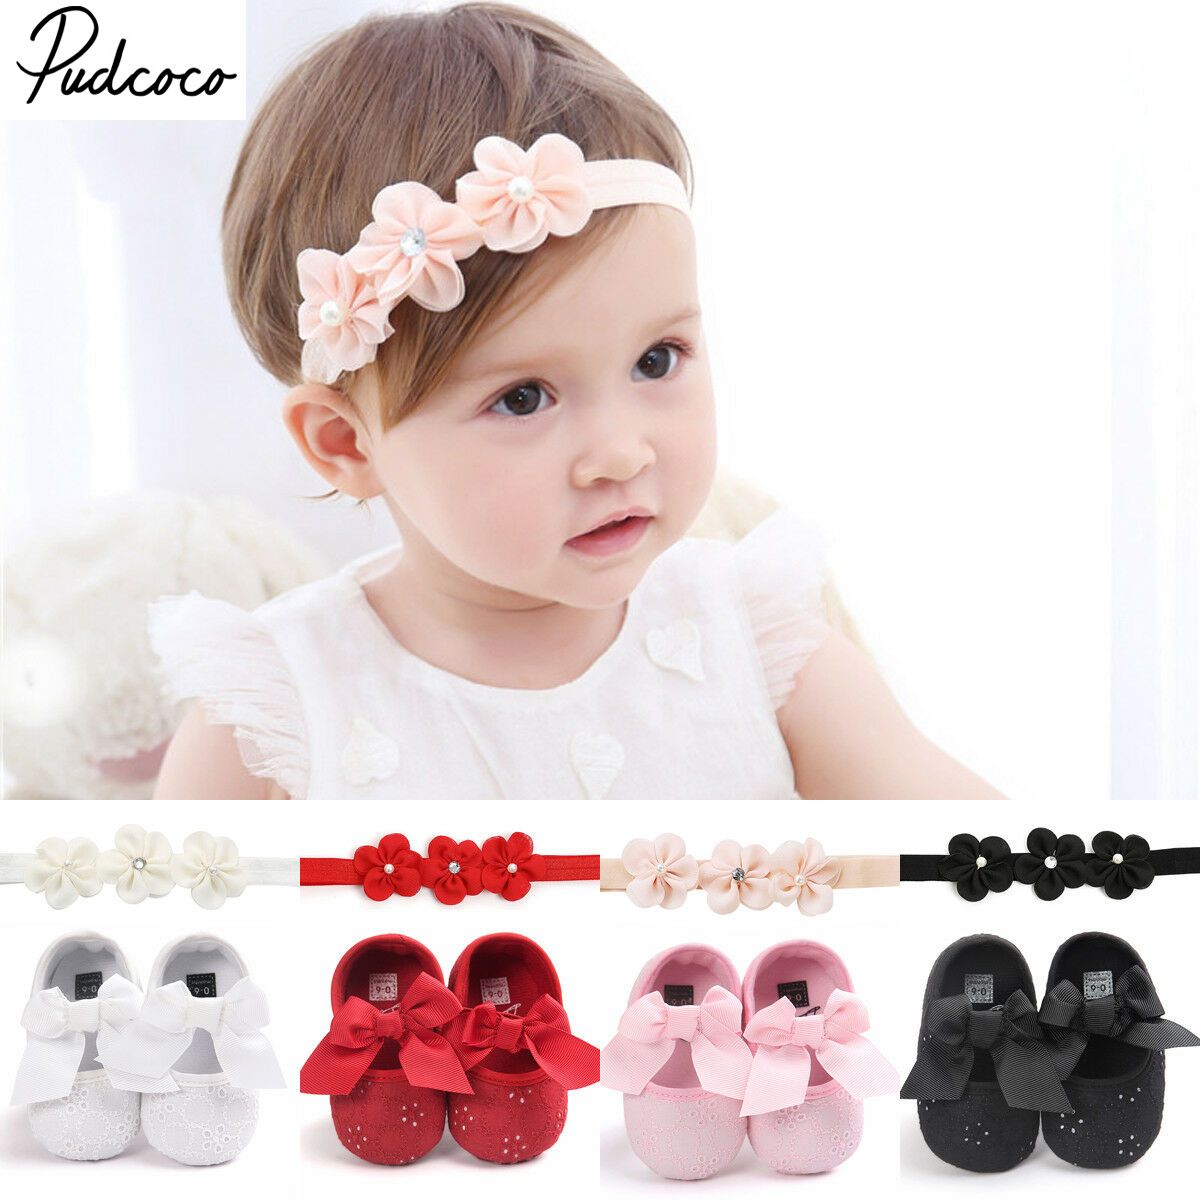 Pudcoco Newborn Toddler Baby Girl Cute Princess Crib Shoes Pram Prewalker Anti-slip Sneakers Soft Sole + Flower Headhand